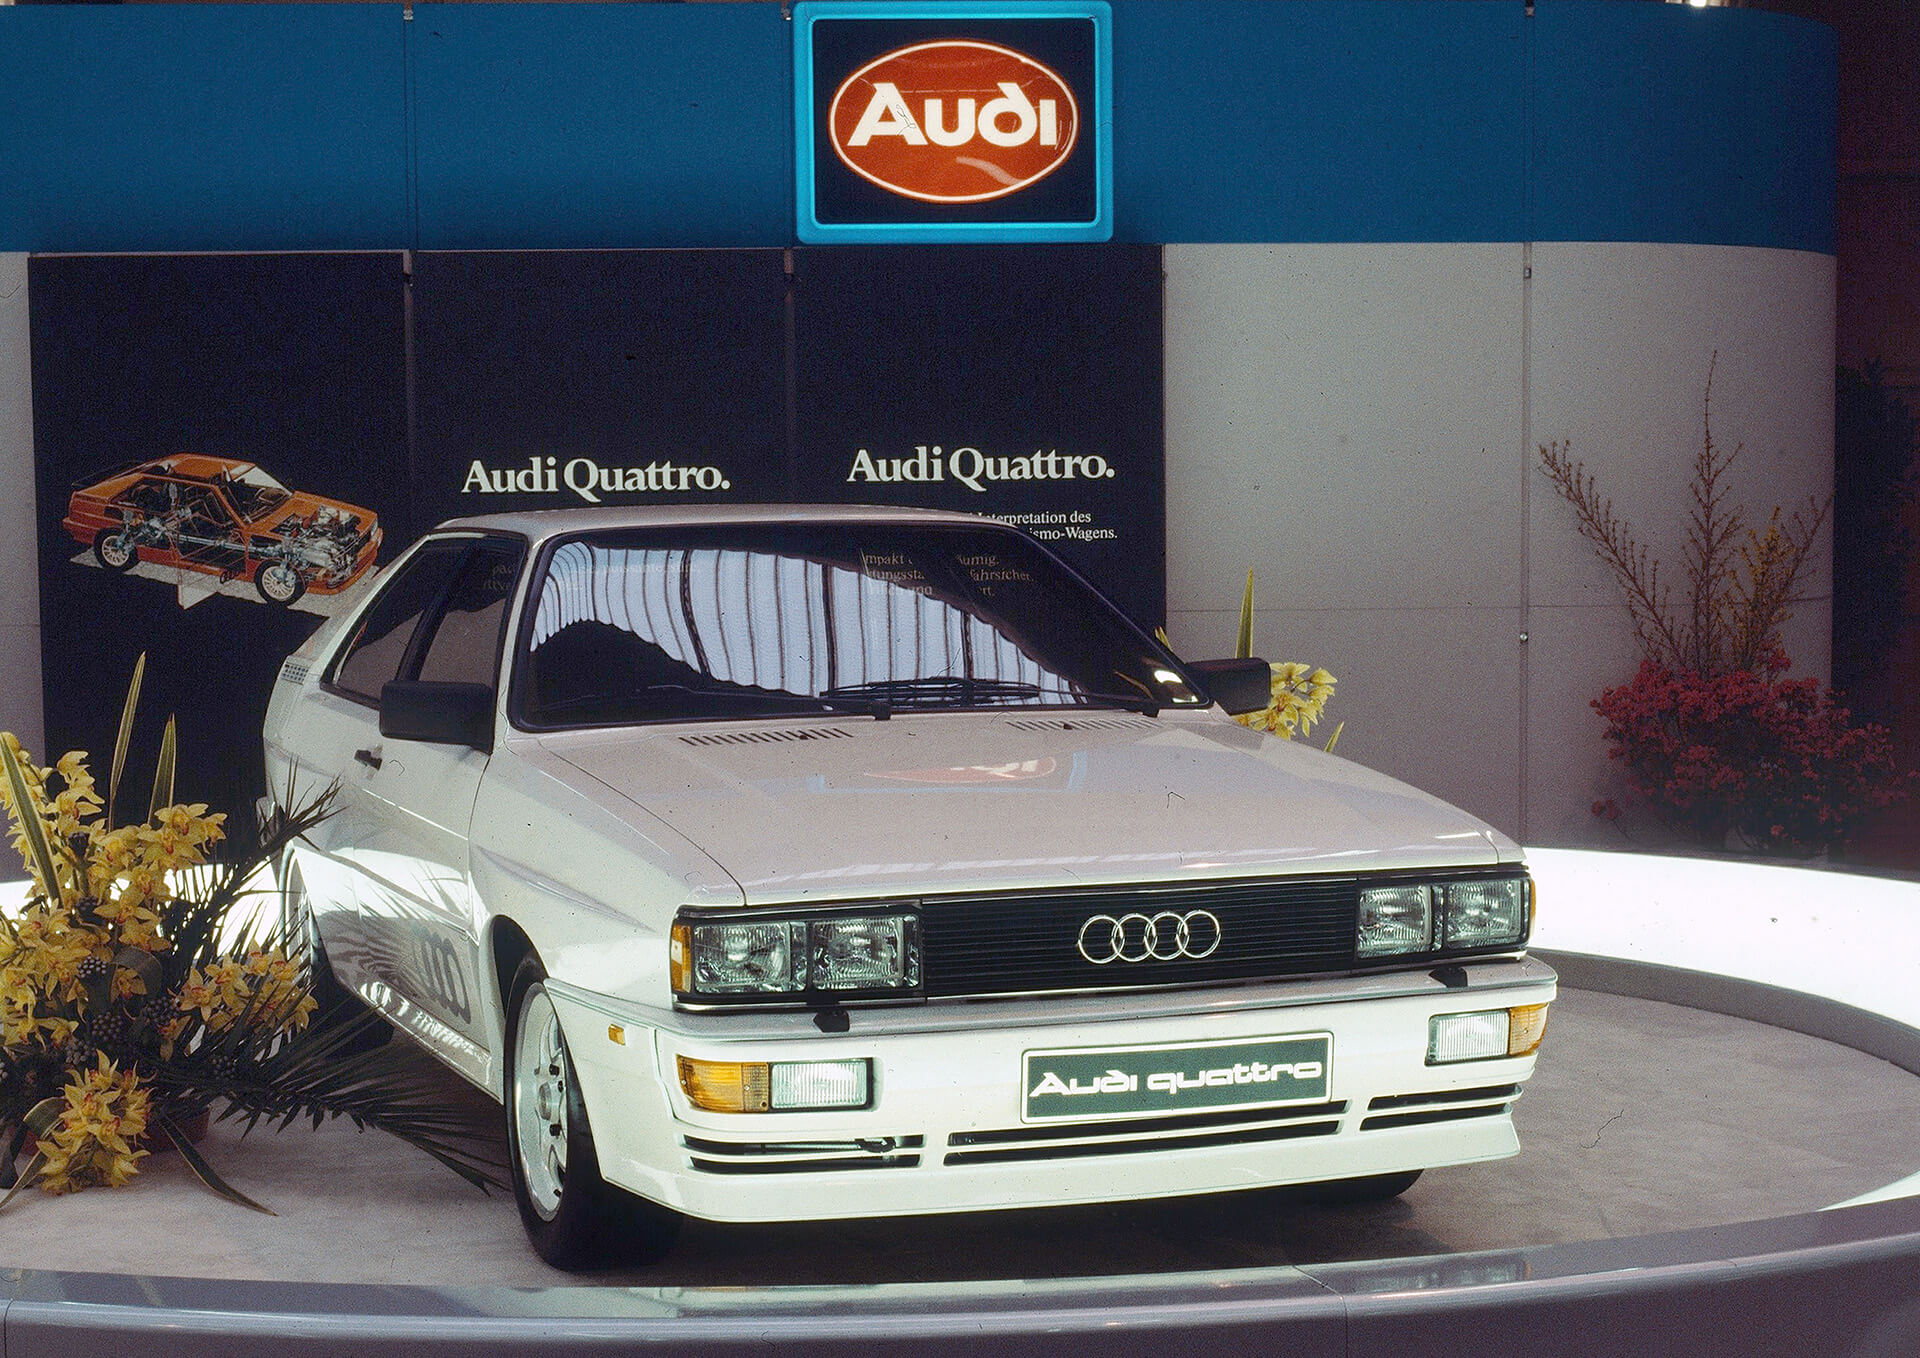 Audi quattro - 75η Έκθεση Αυτοκινήτου της Γενεύης